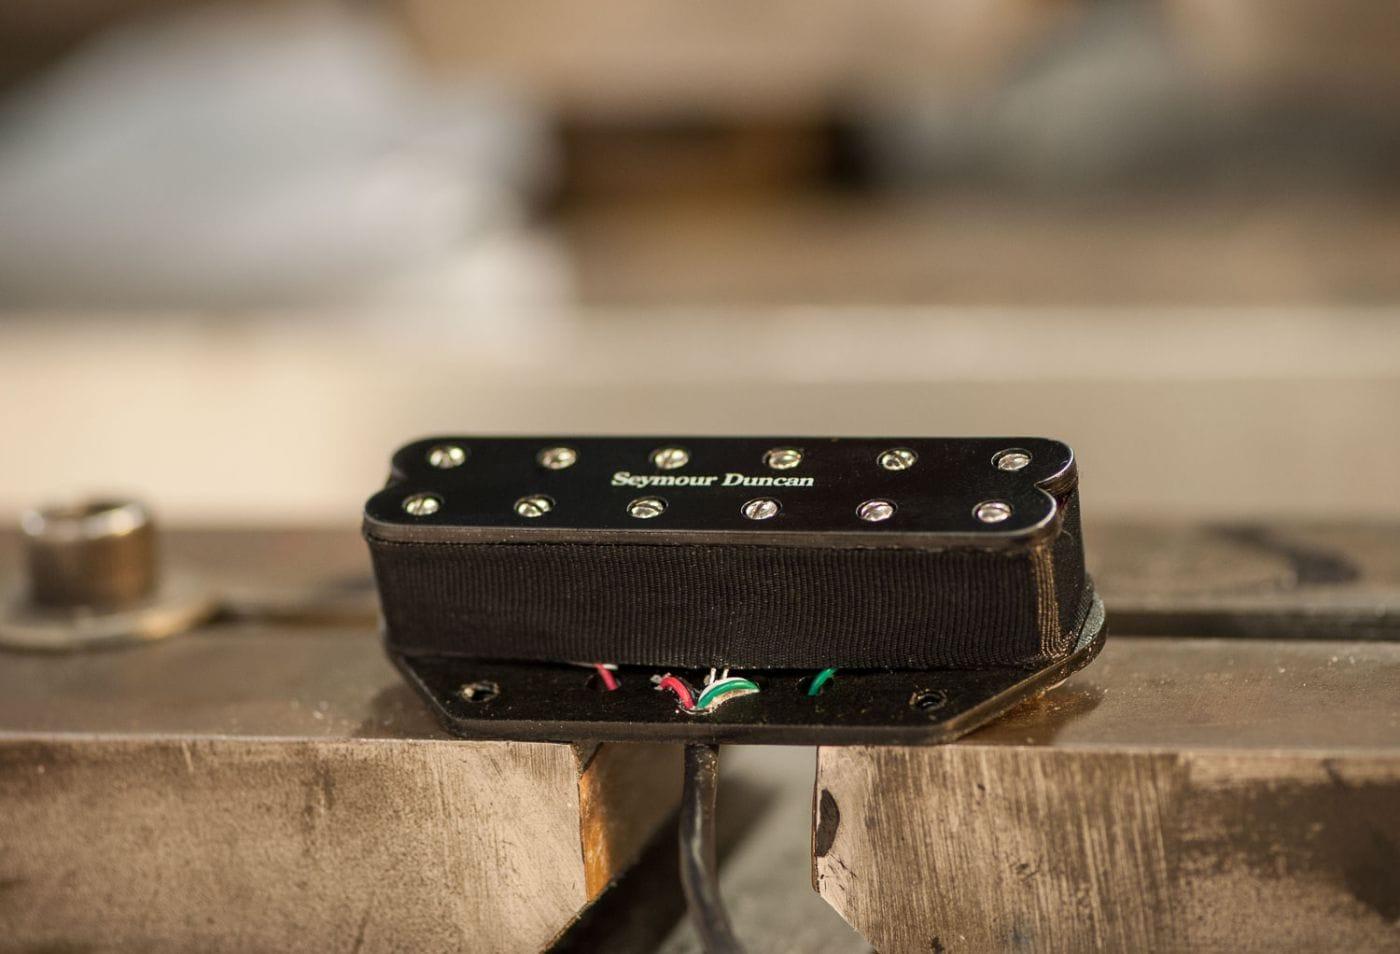 seymour duncan st59 1 little 39 59 humbucker tele bridge pickup black solo guitars. Black Bedroom Furniture Sets. Home Design Ideas